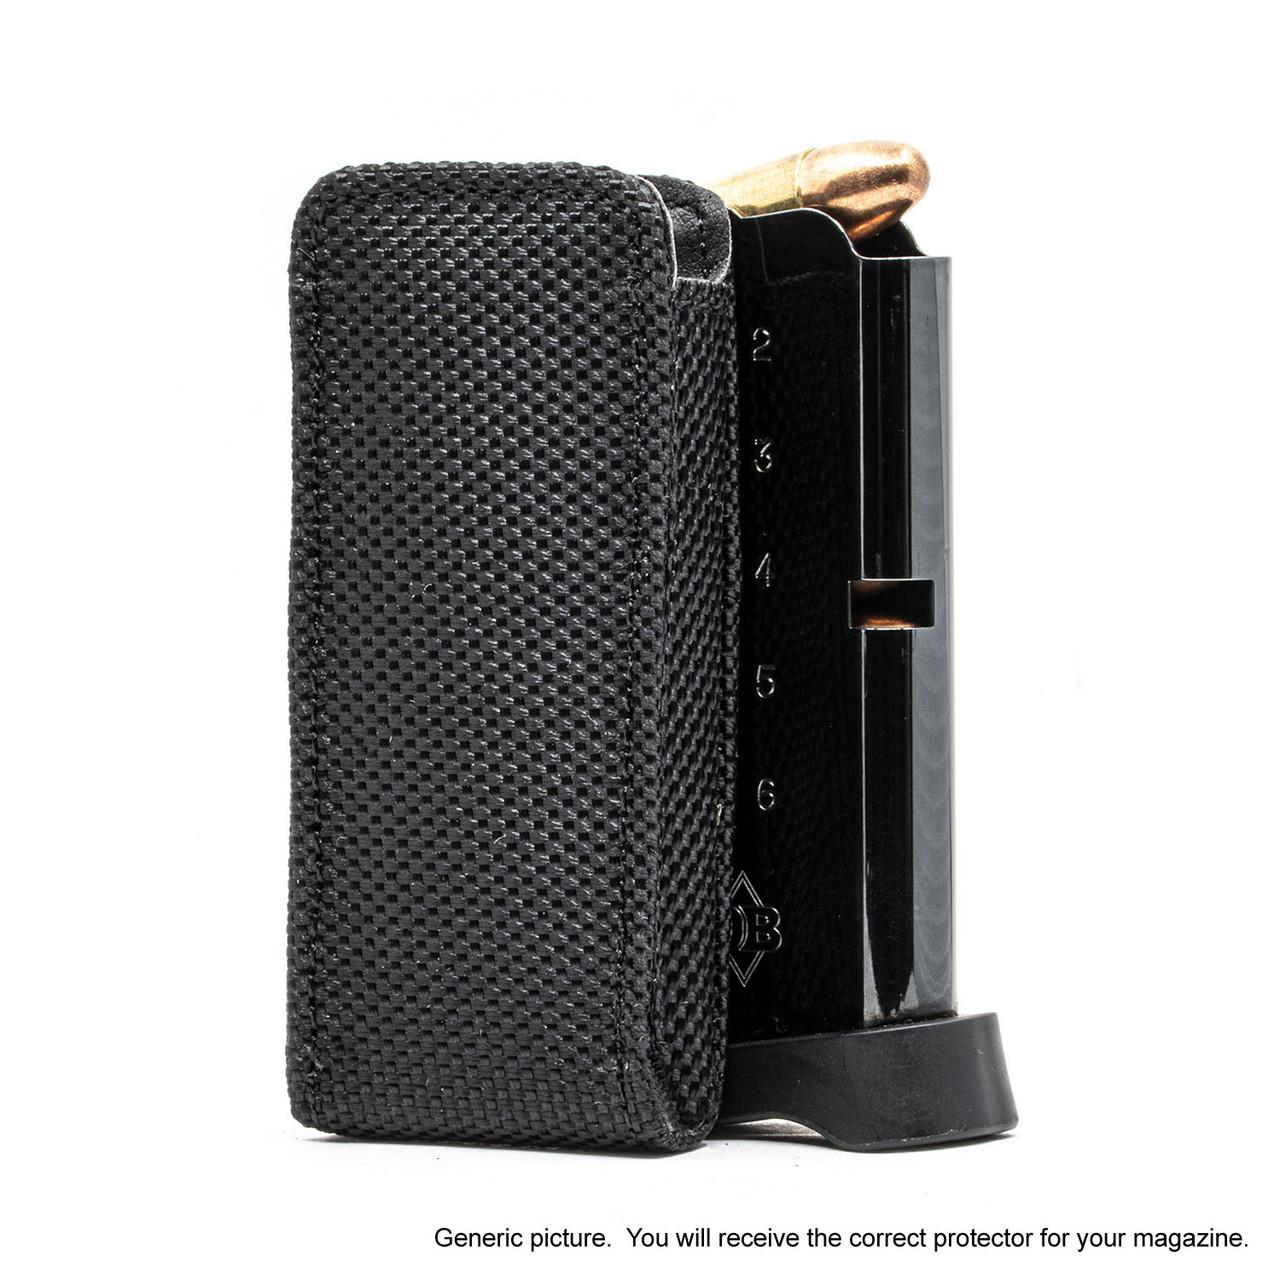 Taurus G3c Holsters Black Ballistic Nylon Magazine Pocket Protector